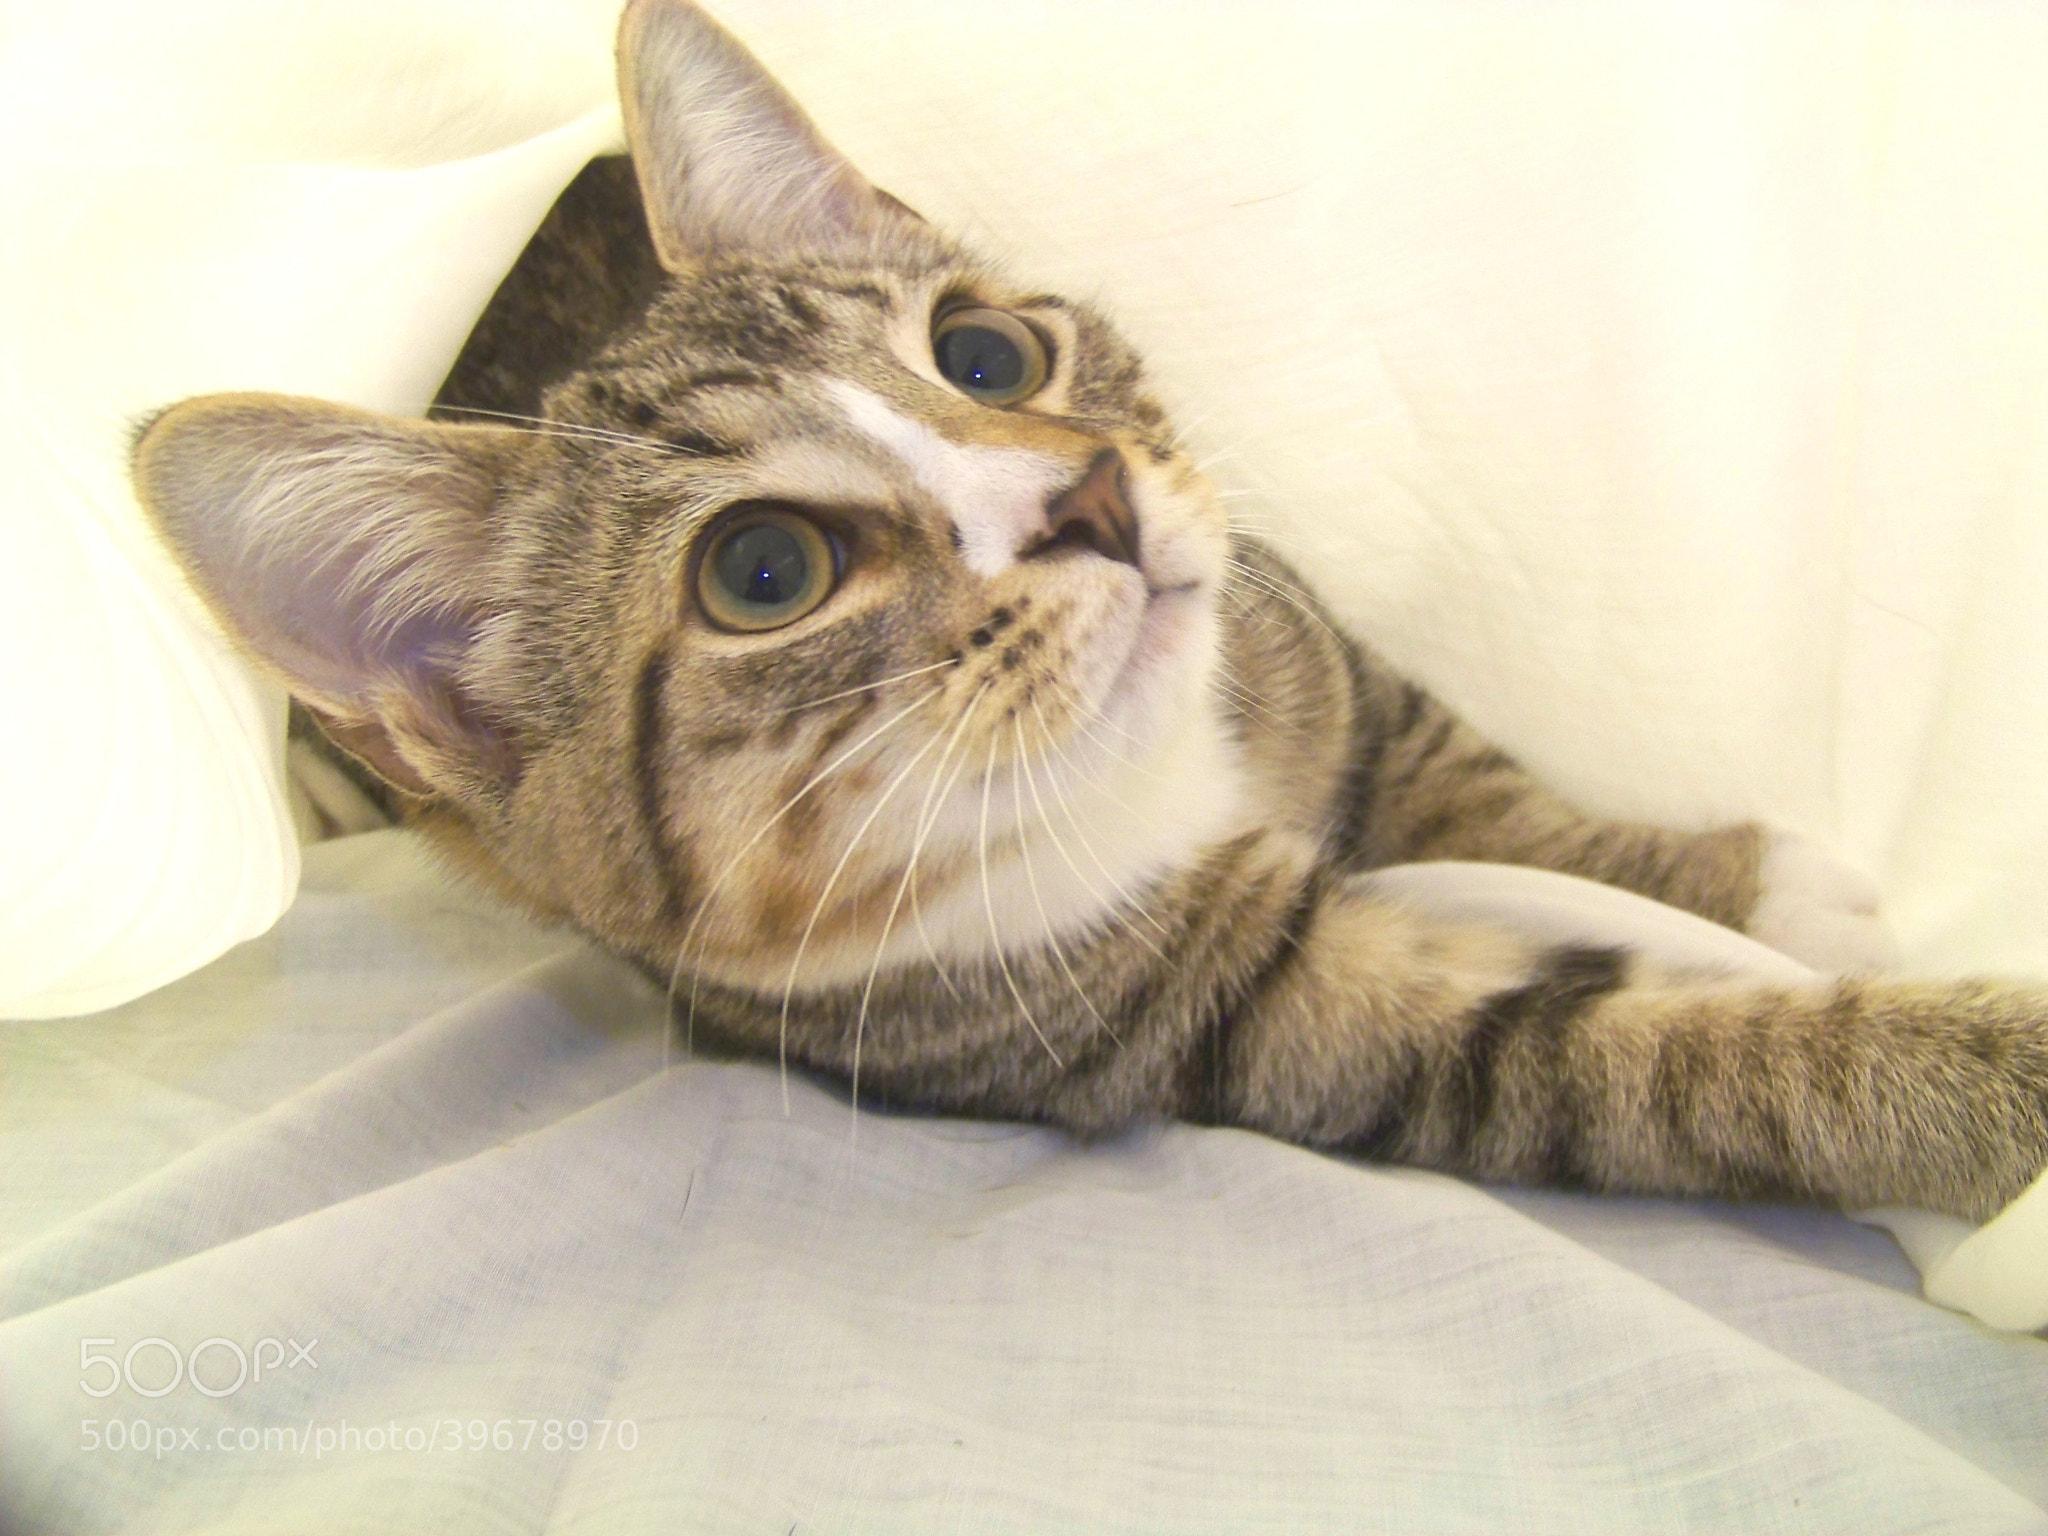 Photograph Precious Tabby Cat by Gita Goodwin on 500px